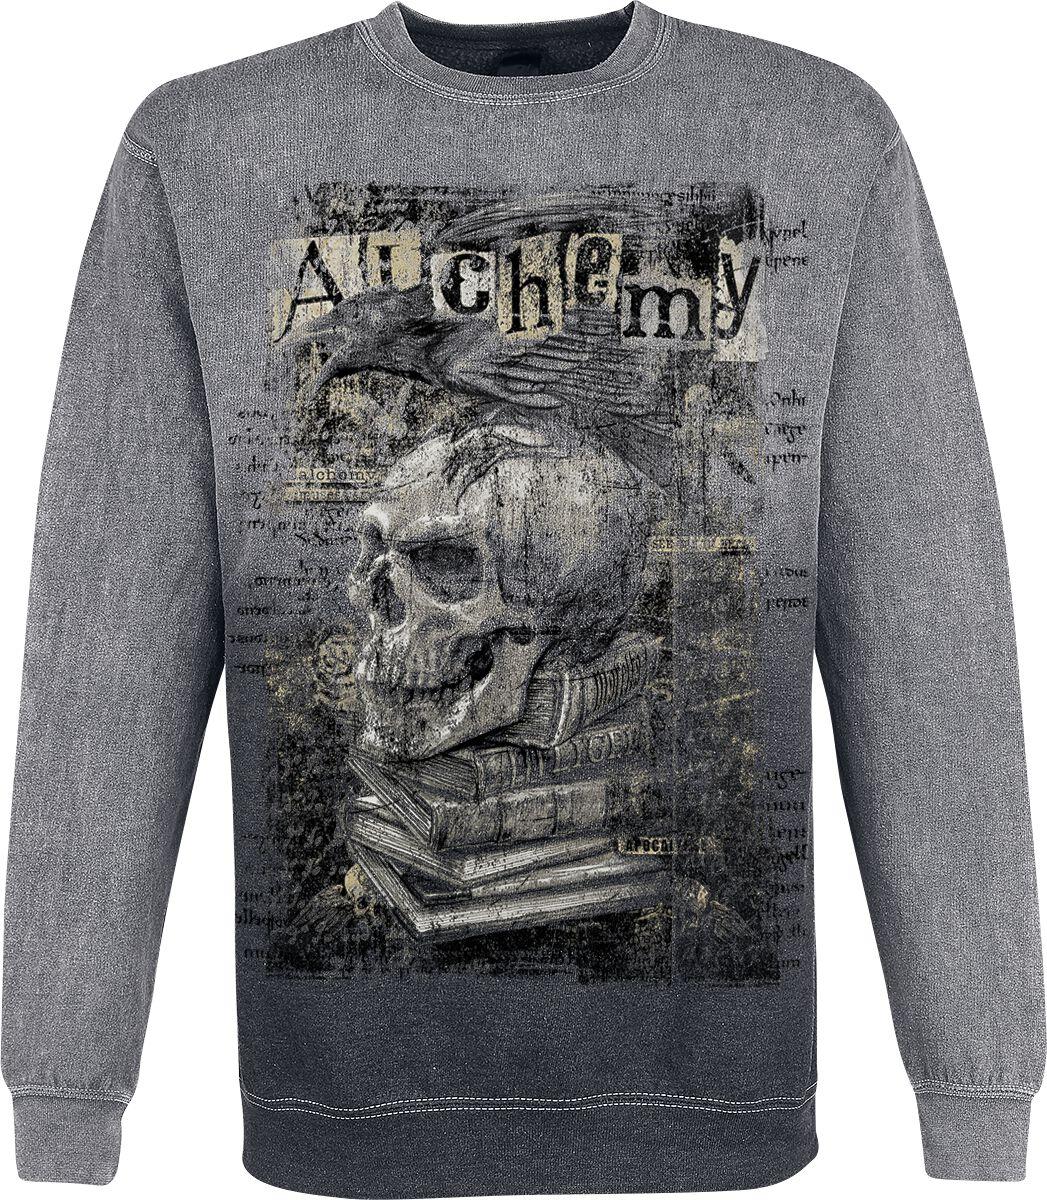 Image of   Alchemy England Poe´s Raven Sweatshirt grå